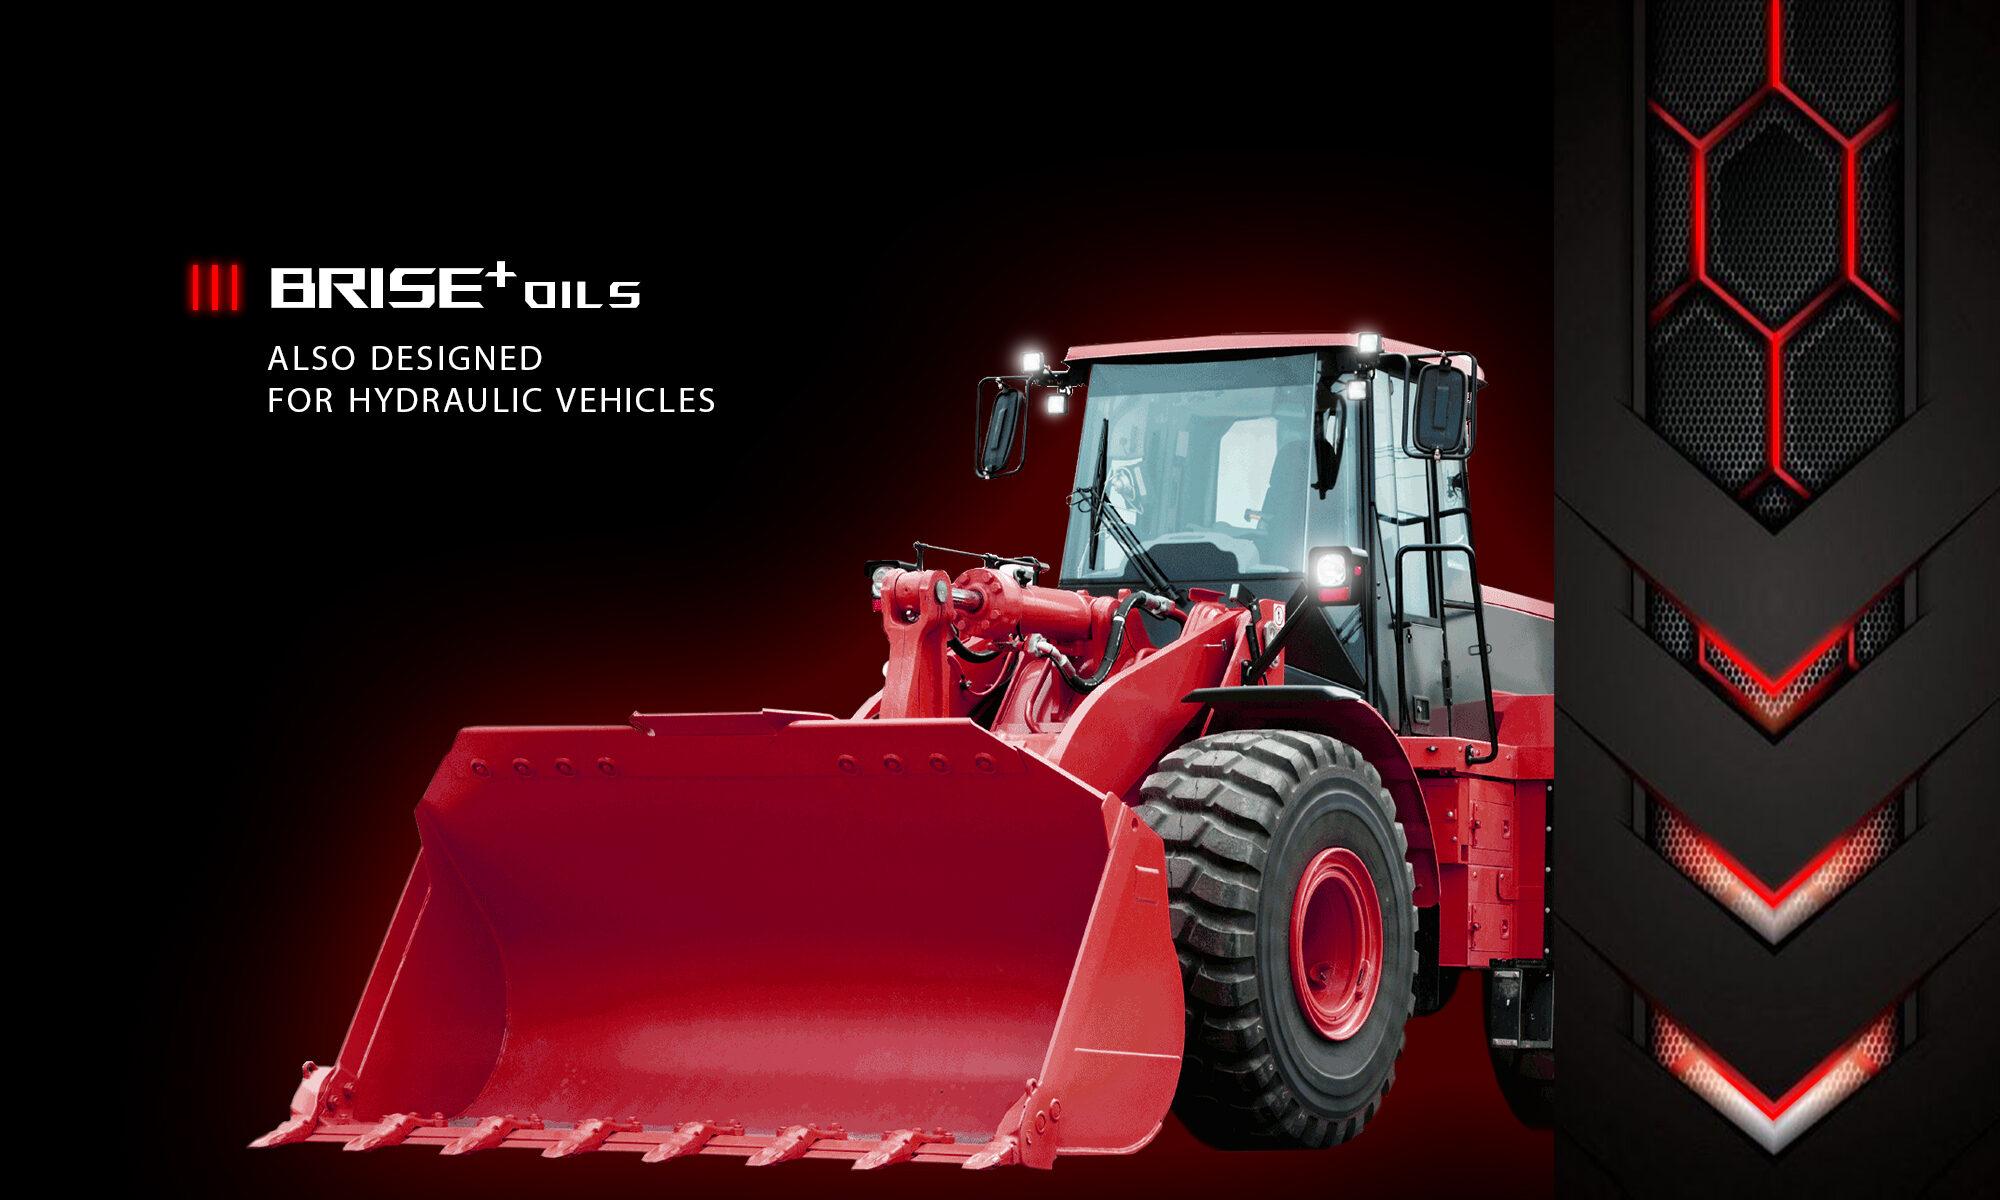 BRISE PLUS ENGIN OIL & RED HYDRAULIC LOADER